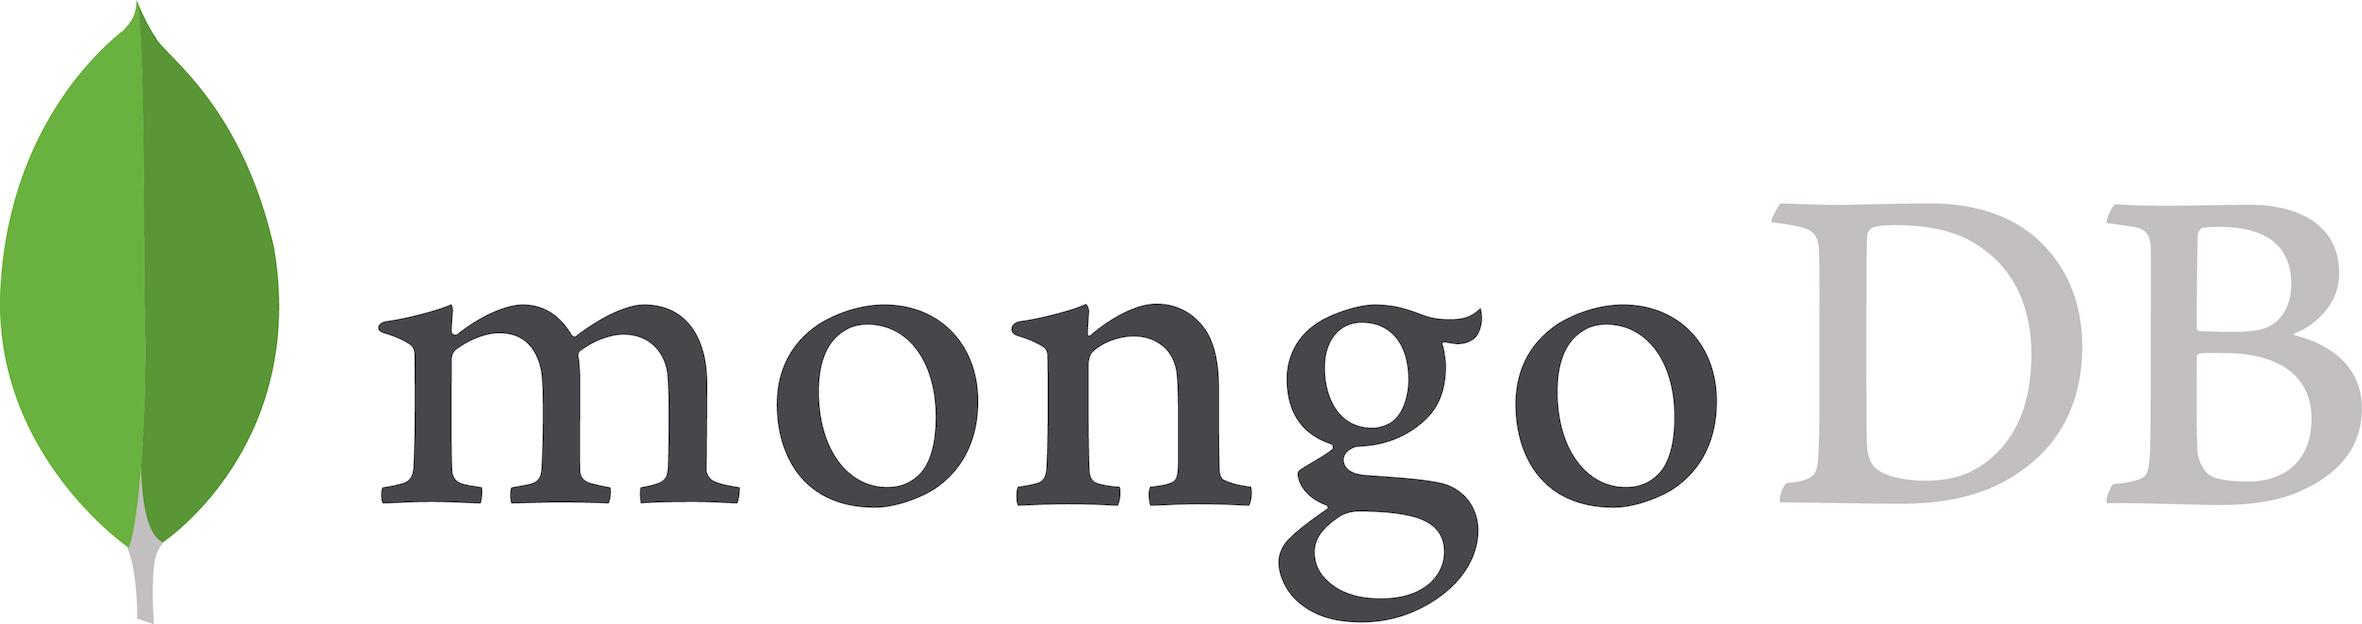 mongodb_logo.jpg